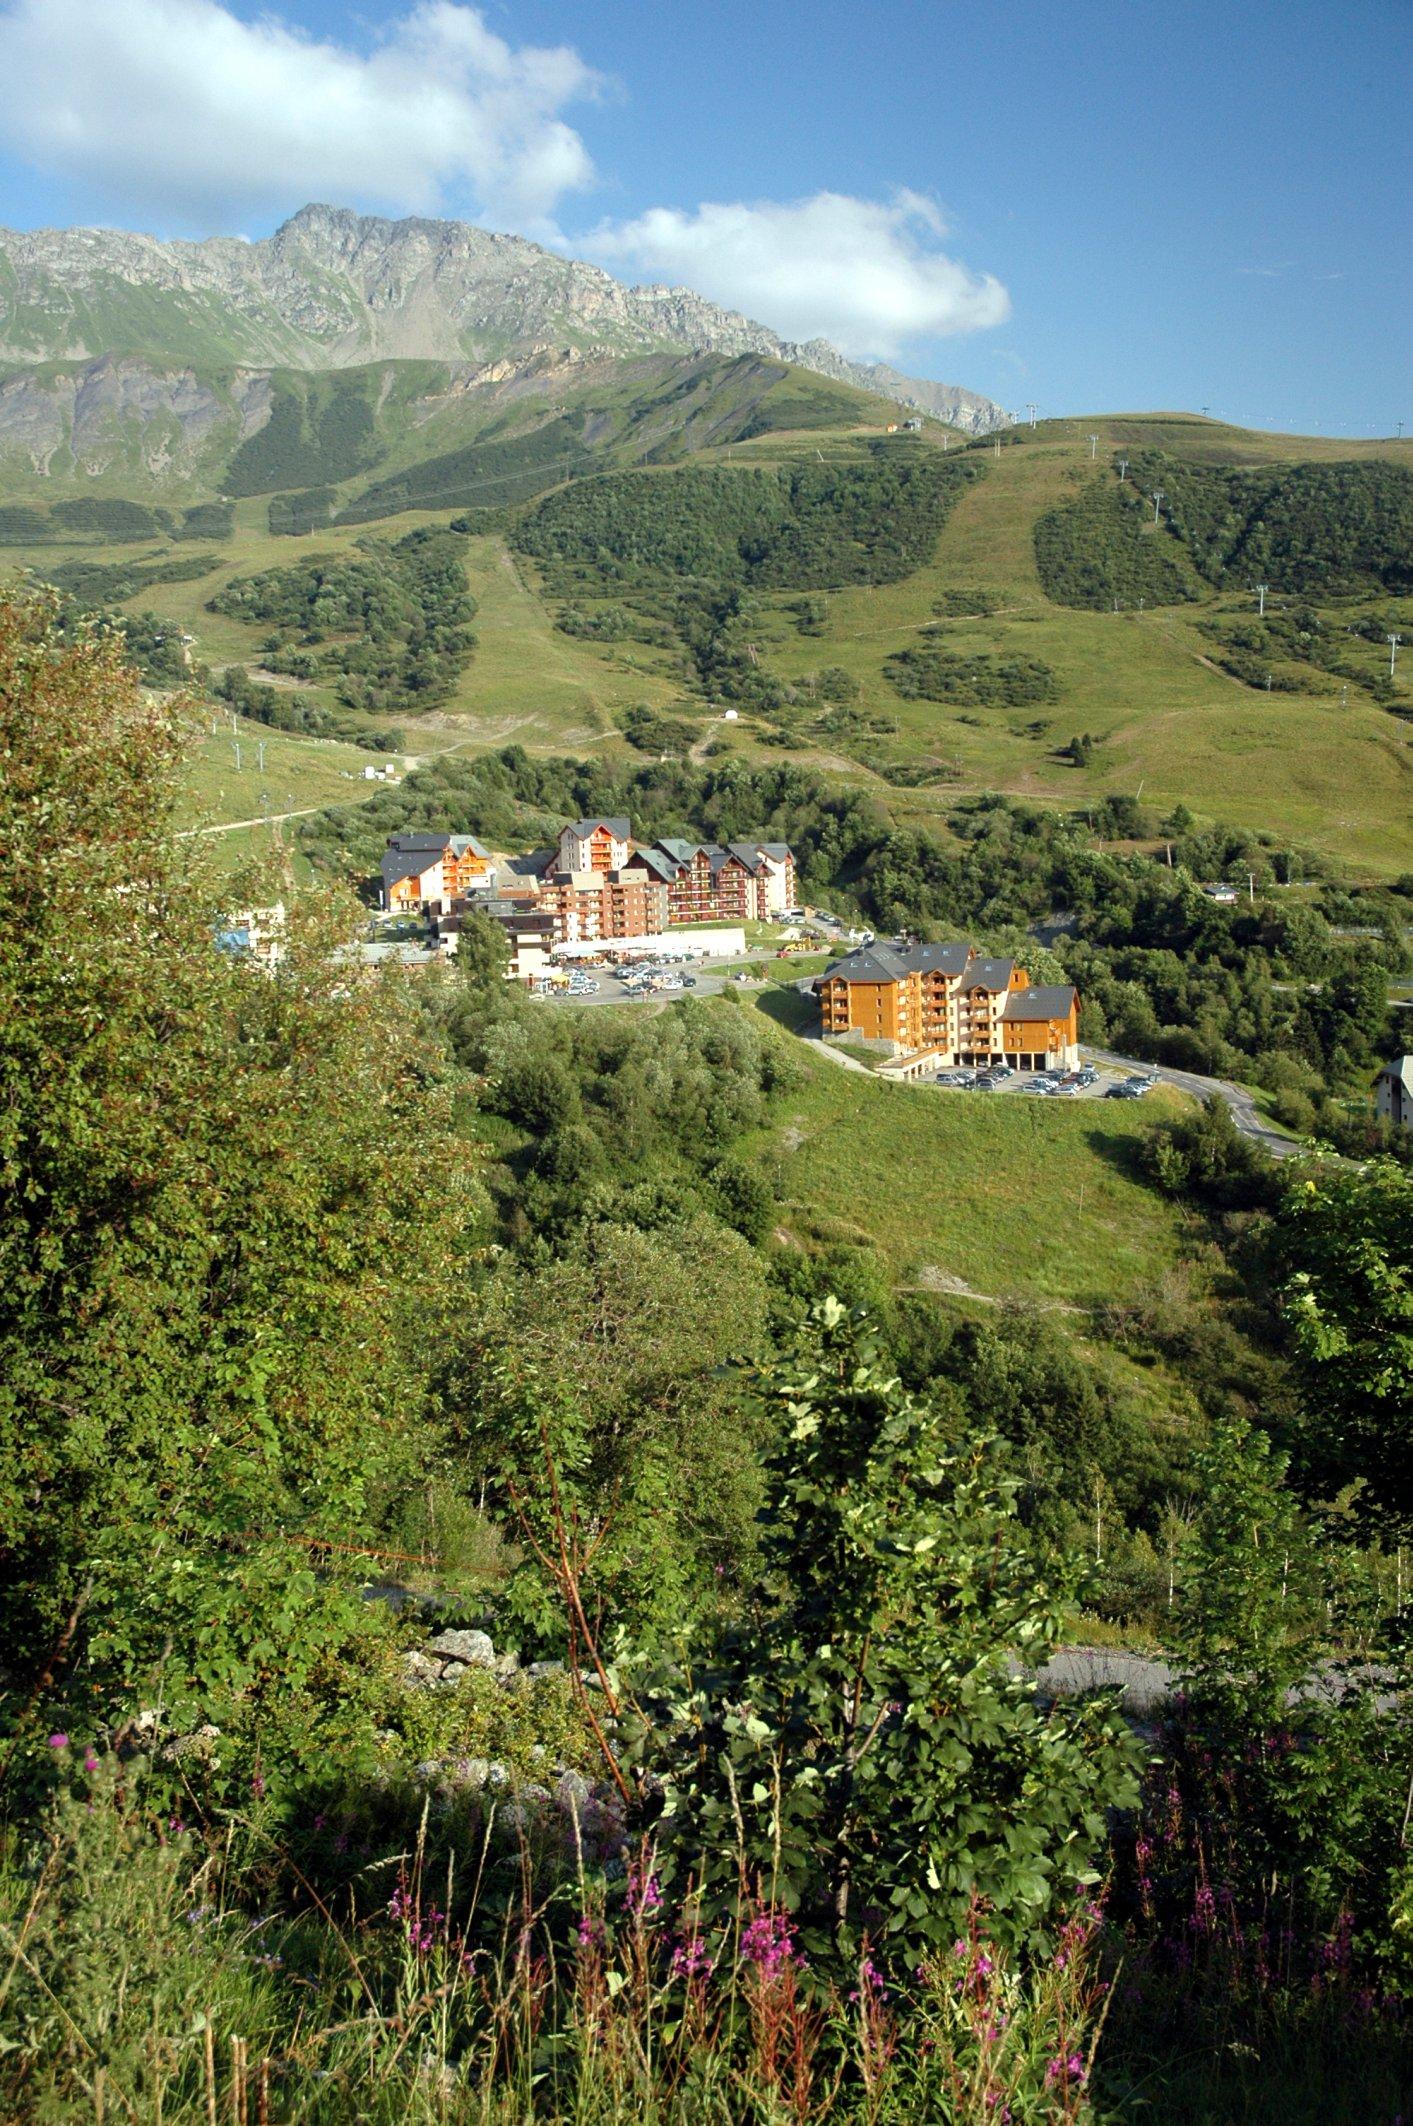 Ferienwohnung St F.Longchamp 3p 6 Belle Vue (1063904), Saint Étienne de Cuines, Savoyen, Rhône-Alpen, Frankreich, Bild 31